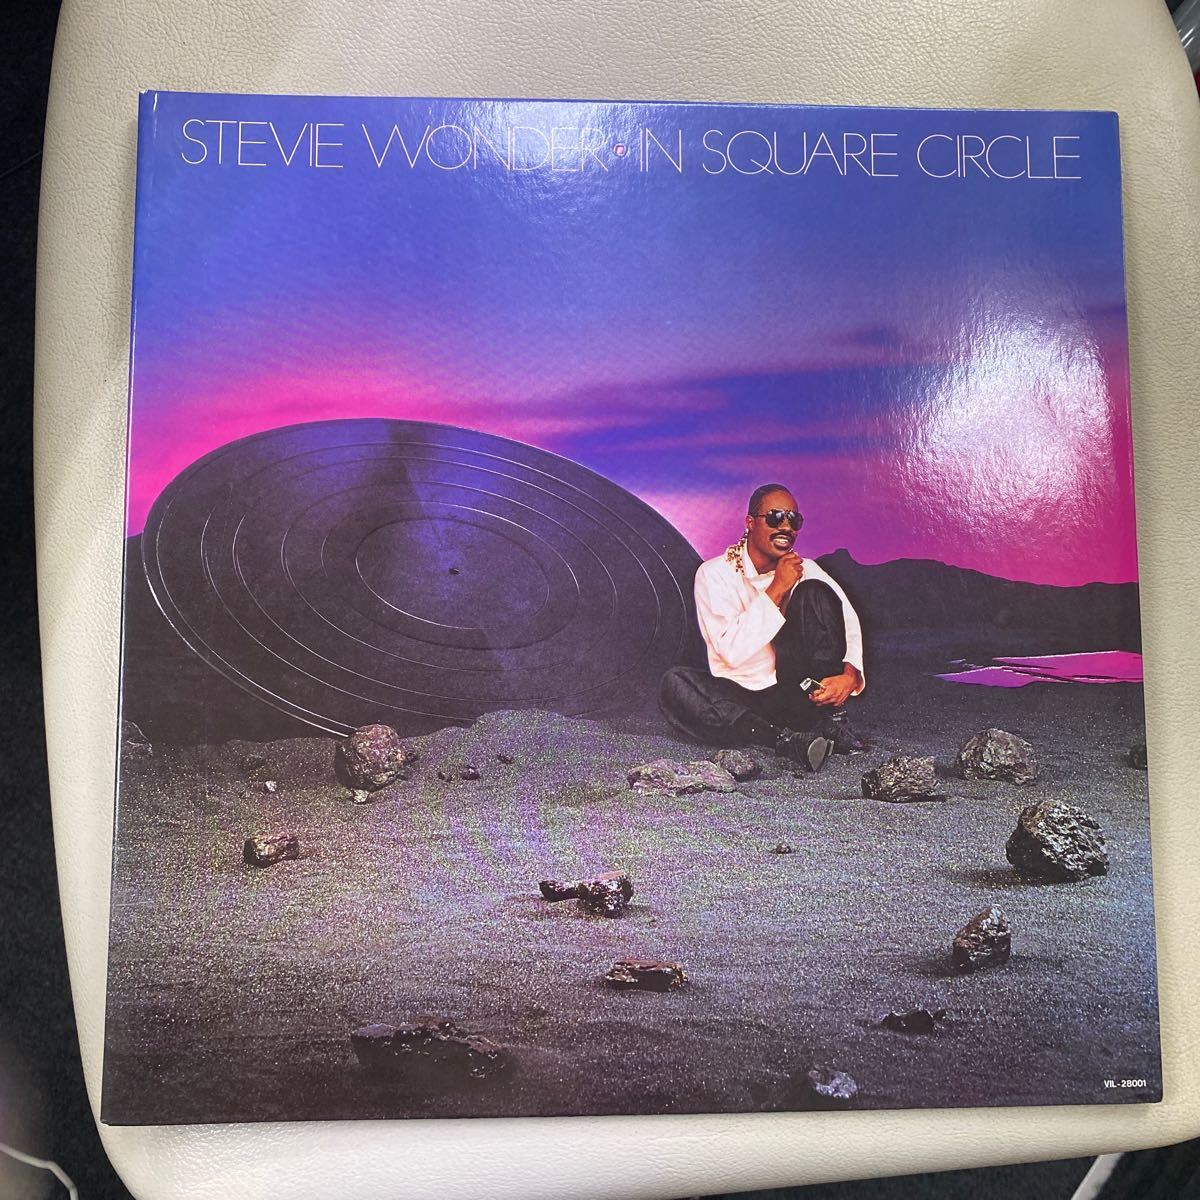 LP Stevie Wonder In Square Circle VIL28001 MOTOWN (レコード盤)